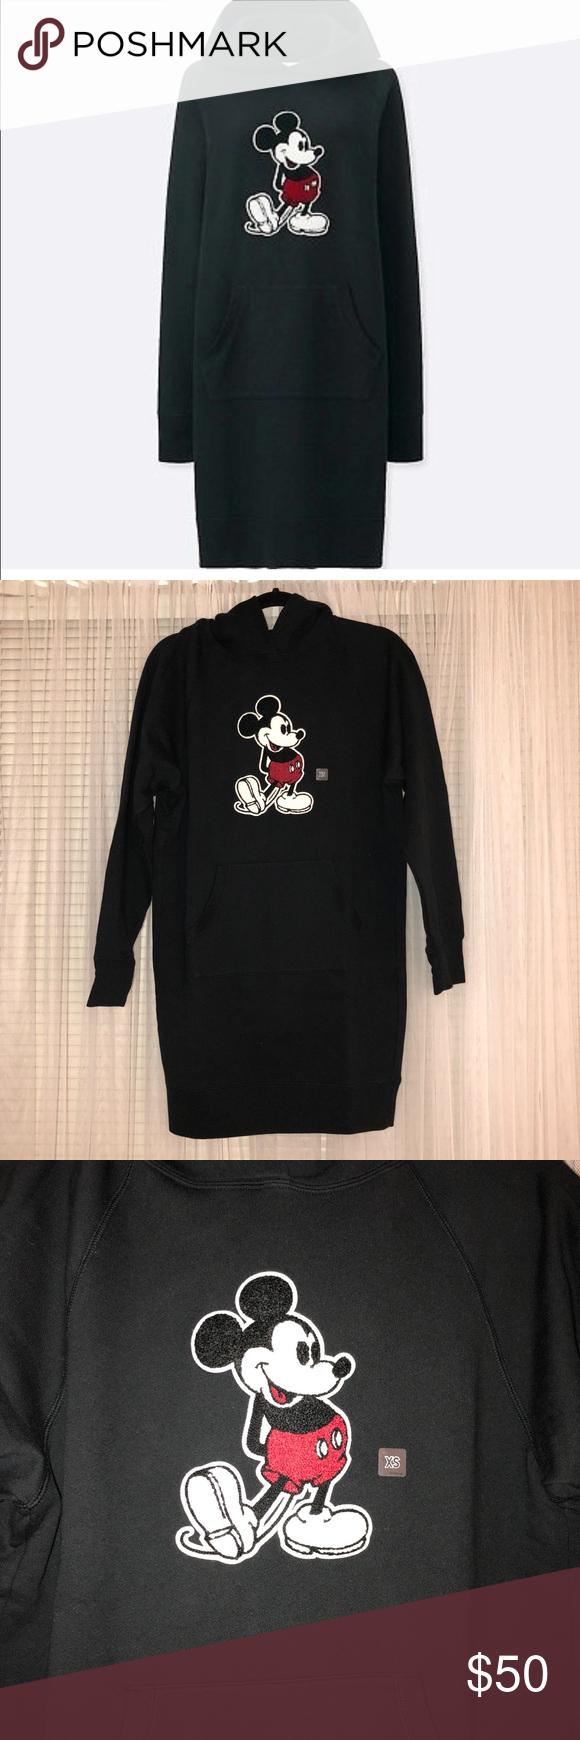 6d68ab1d46c UNIQLO Mickey Graphic Sweat Long Sleeve Dress Women s UNIQLO Mickey Stands  Graphic Sweat Long Sleeve Dress with Hood. Color is black